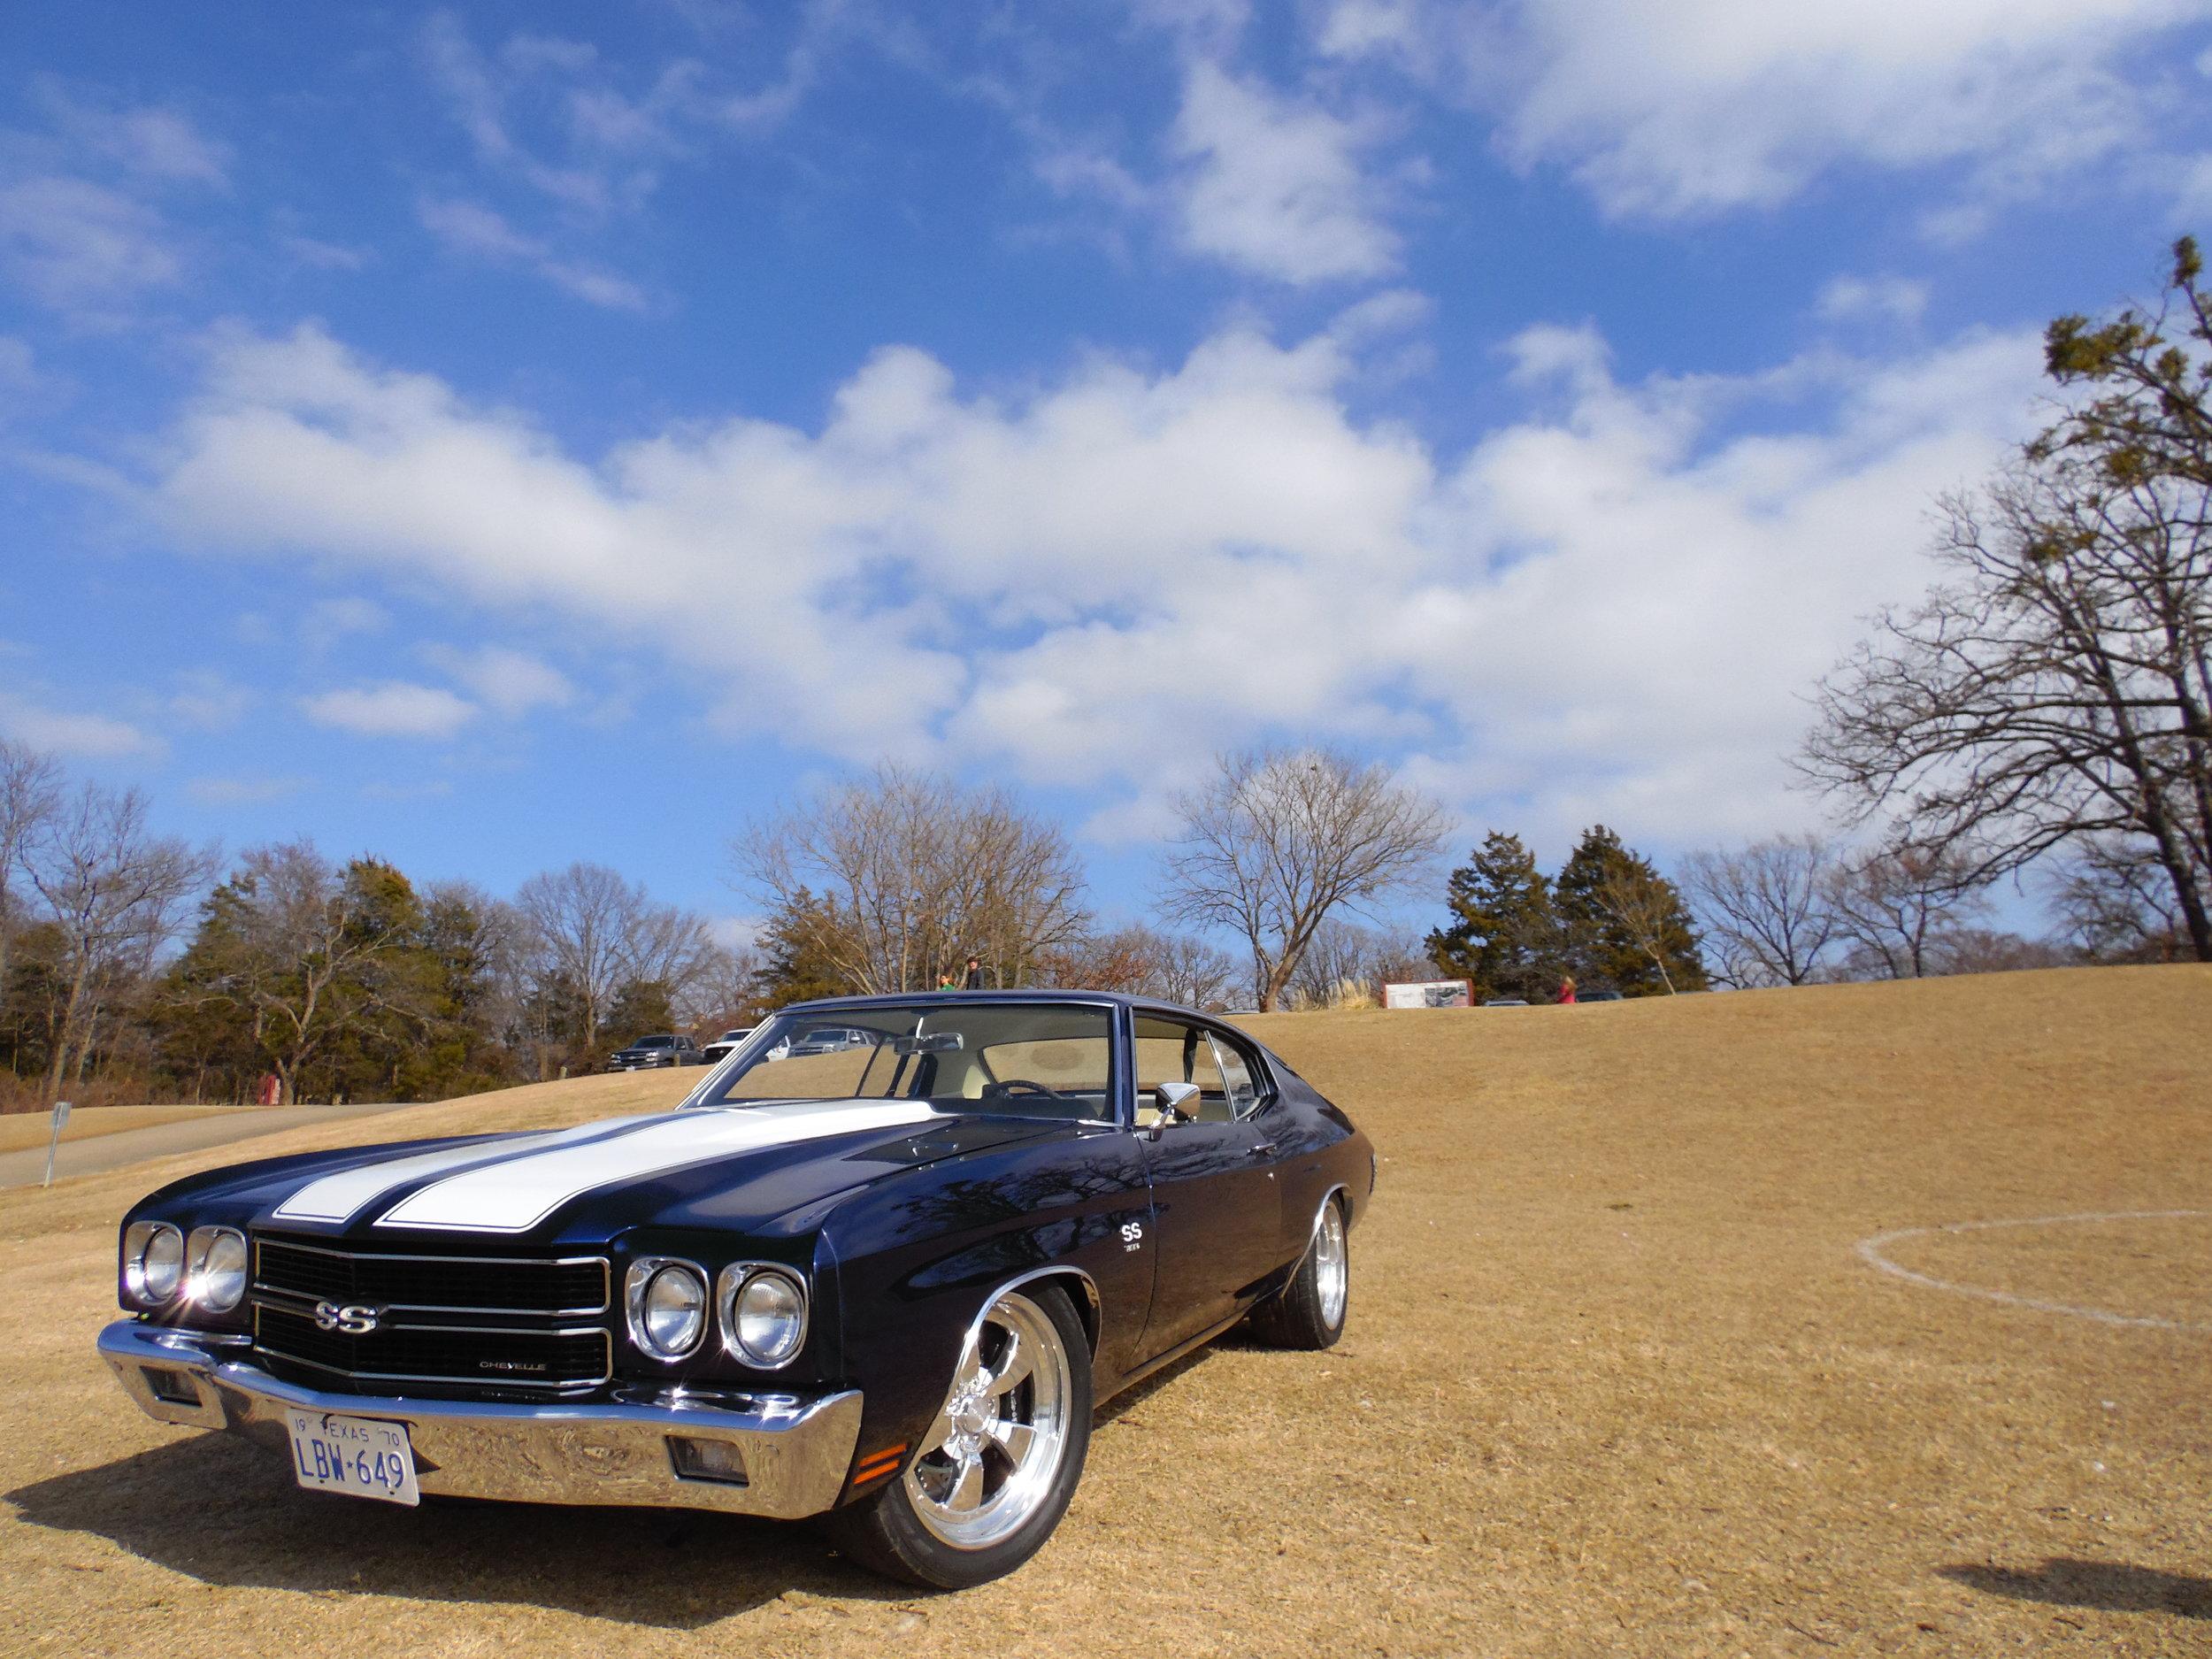 1970 Chevrolet Chevelle SS